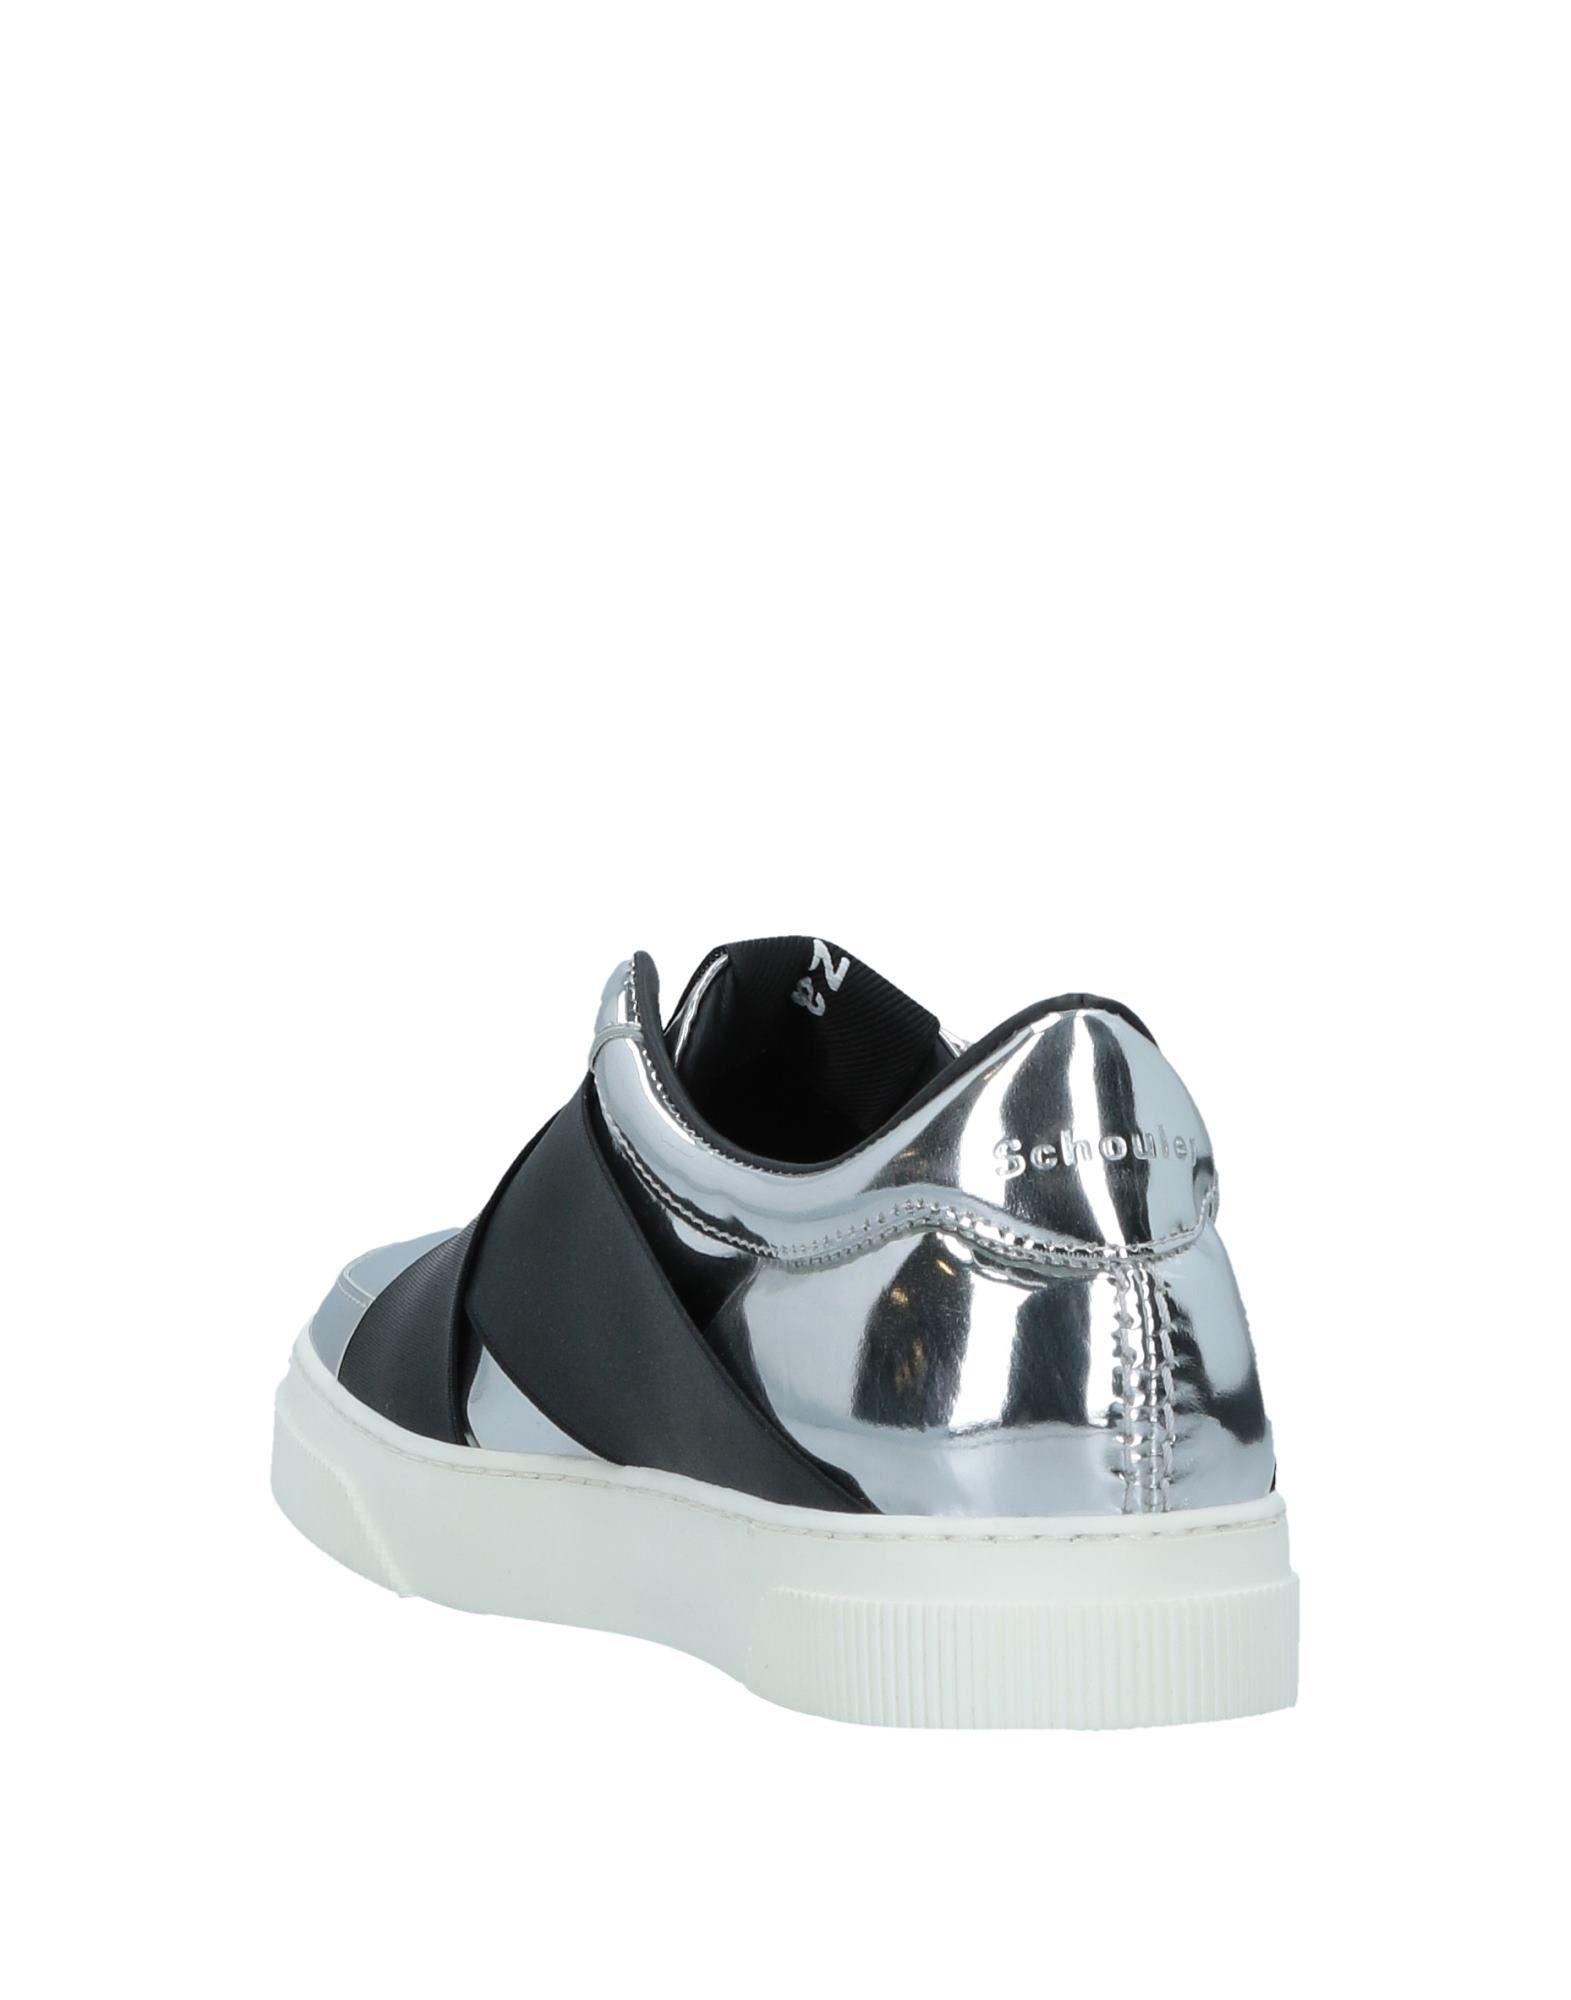 Proenza Schouler  Sneakers Damen  Schouler 11505043QW Beliebte Schuhe ed4e27